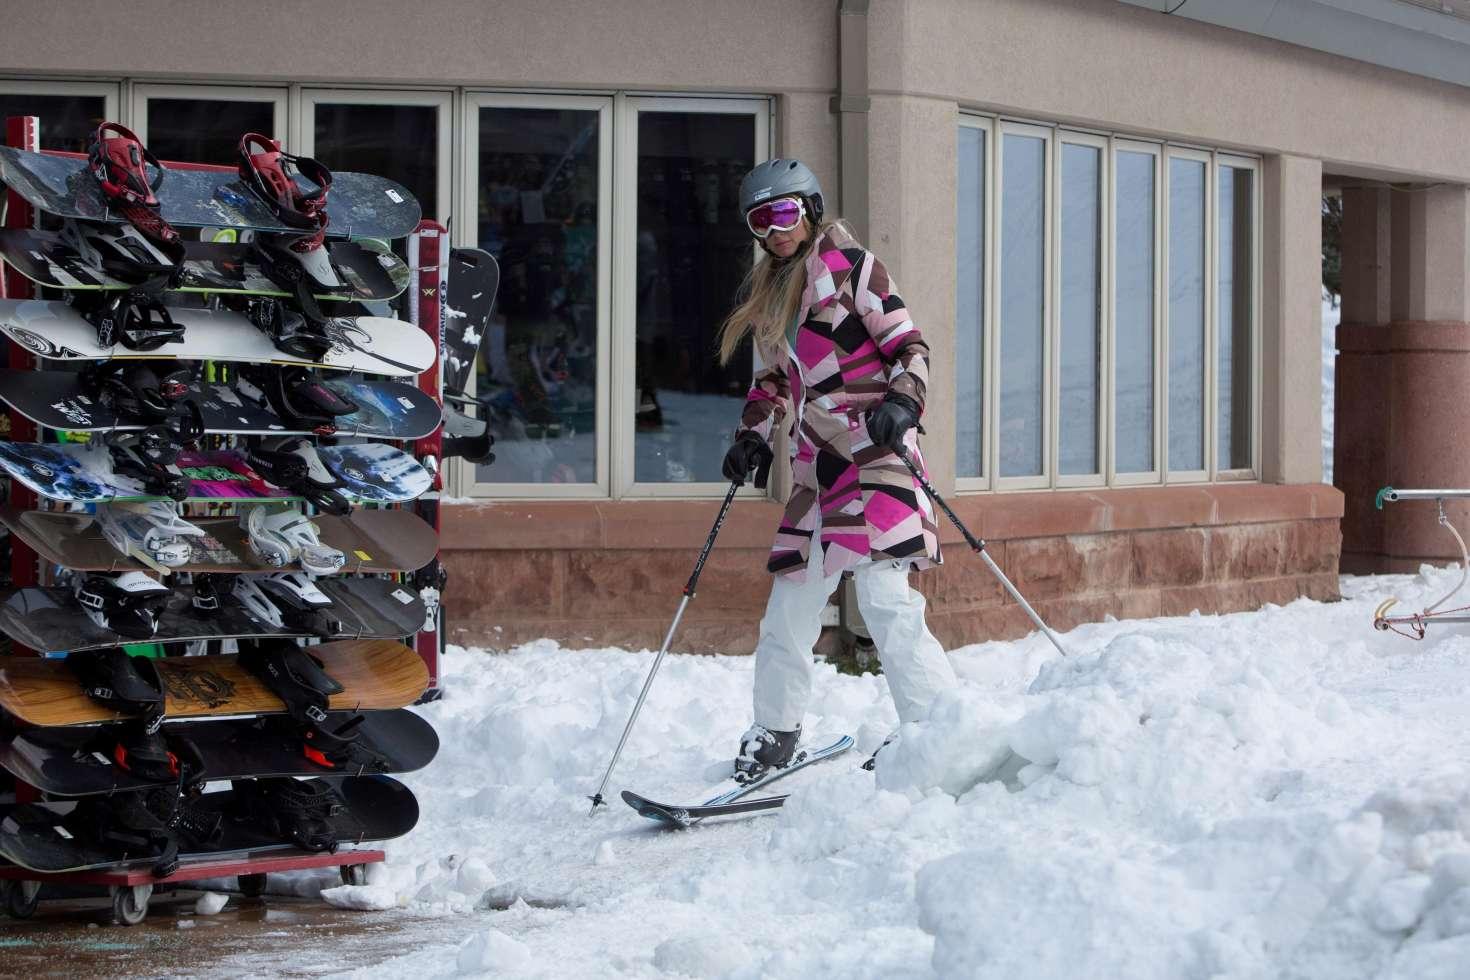 Paris Hilton 2016 : Paris Hilton Skiing in Aspen -27